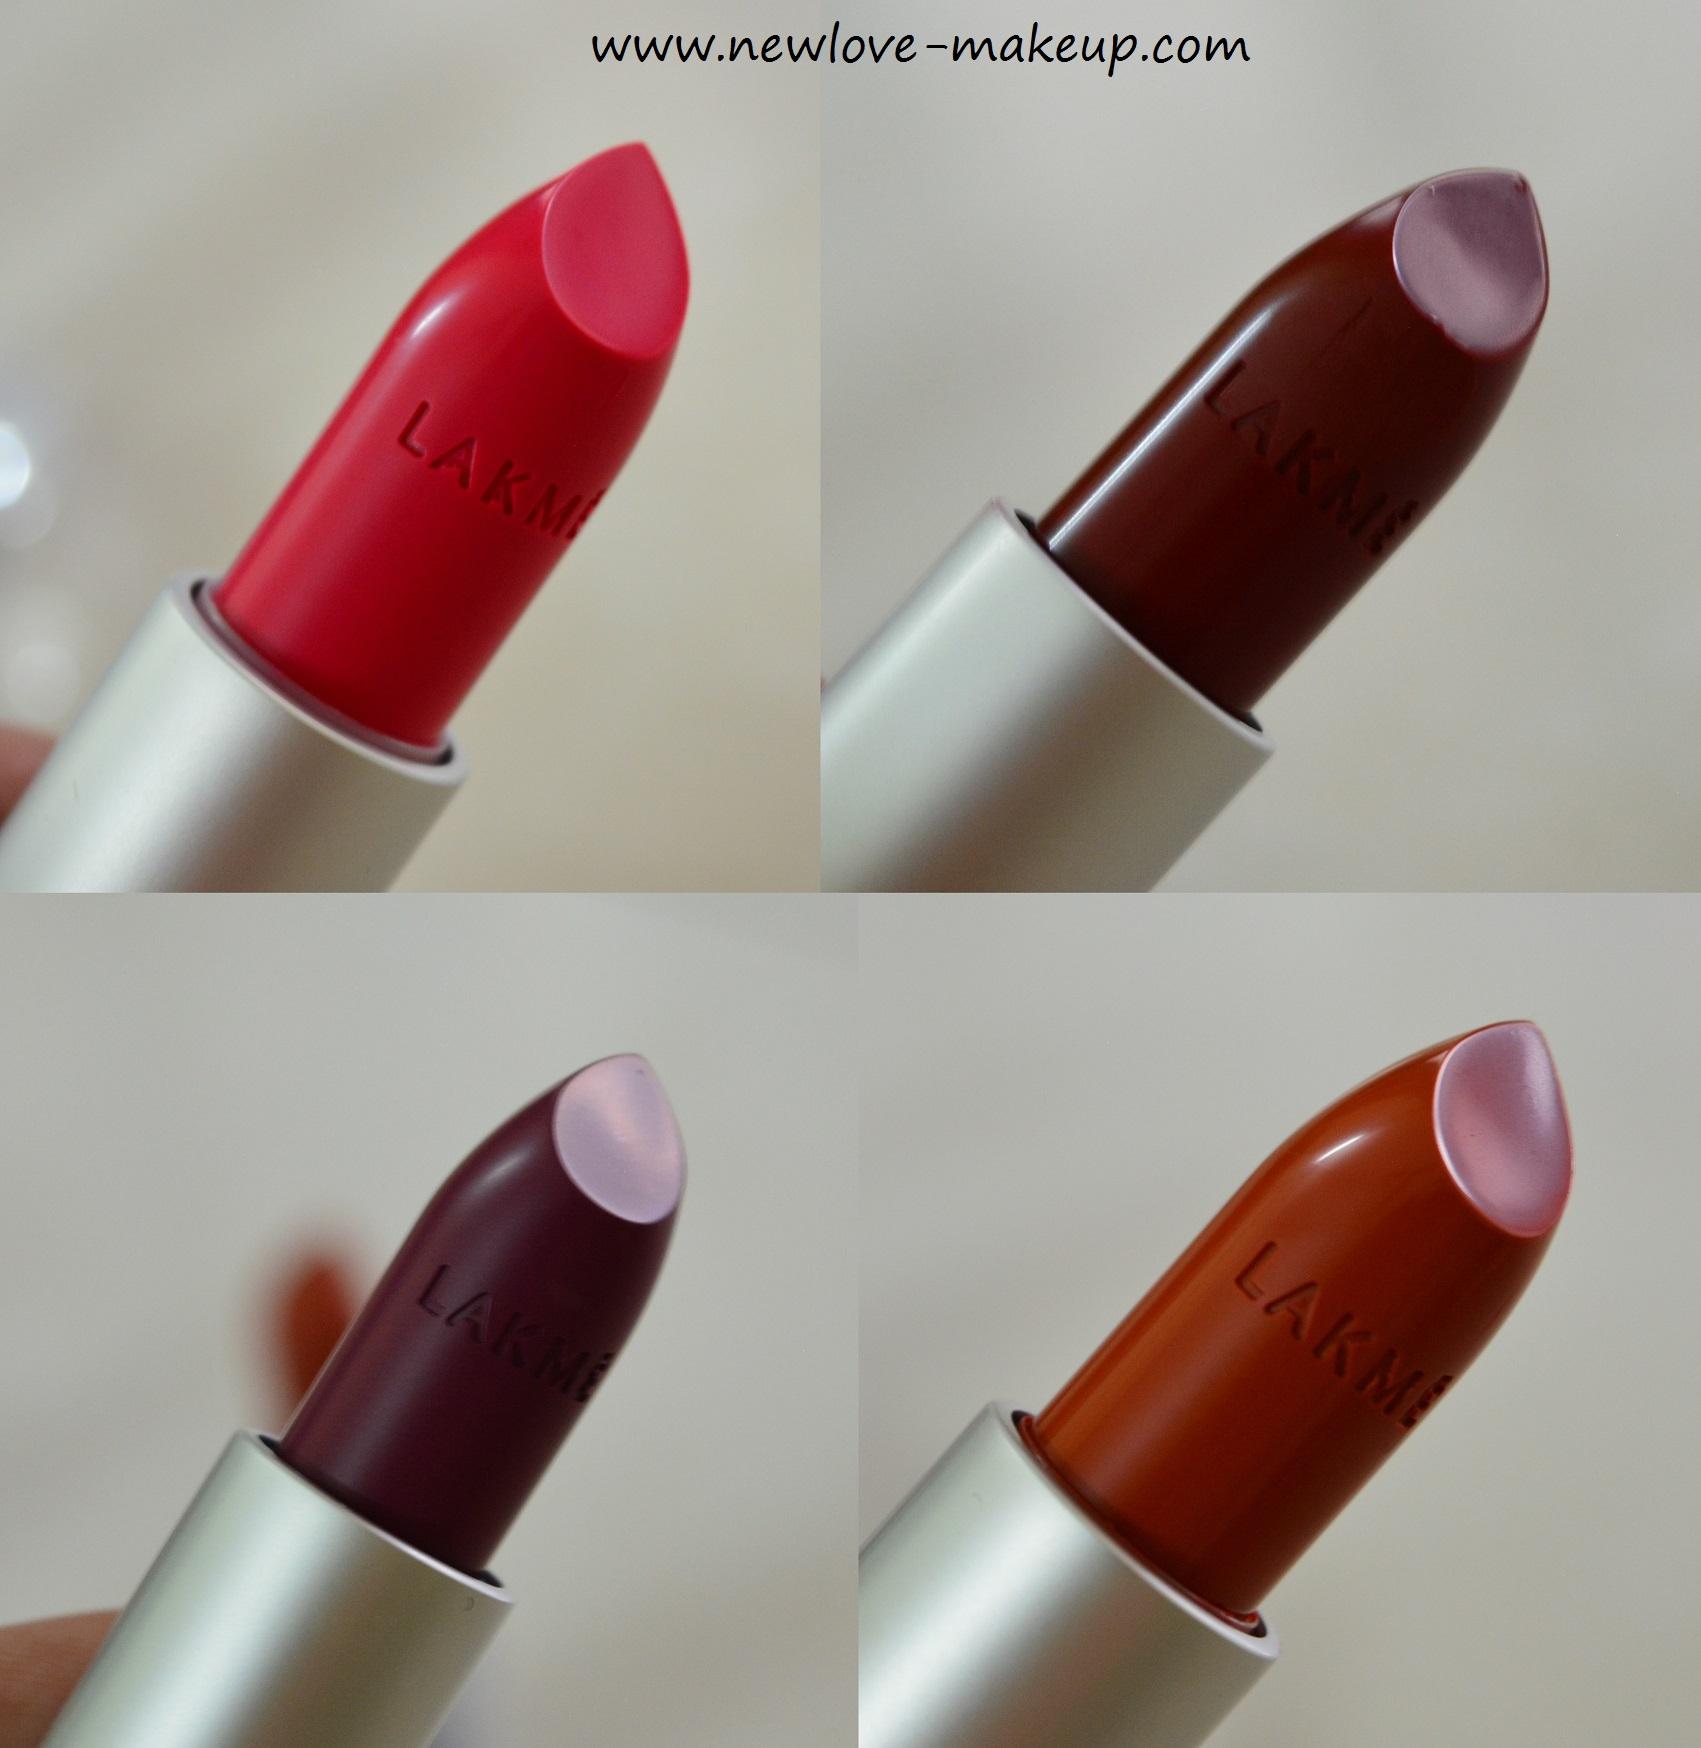 New Lakme Enrich Matte Lipsticks Review Swatches New Love Makeup